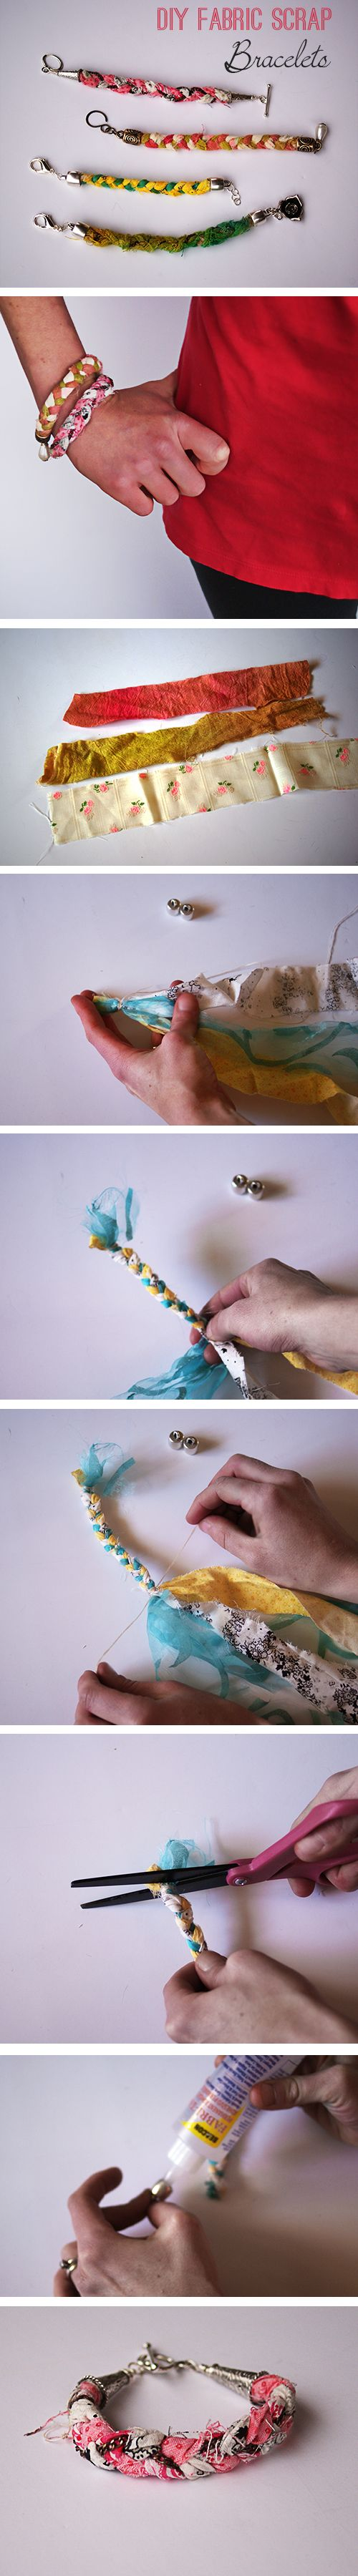 Easy Scrap Fabric Bracelet